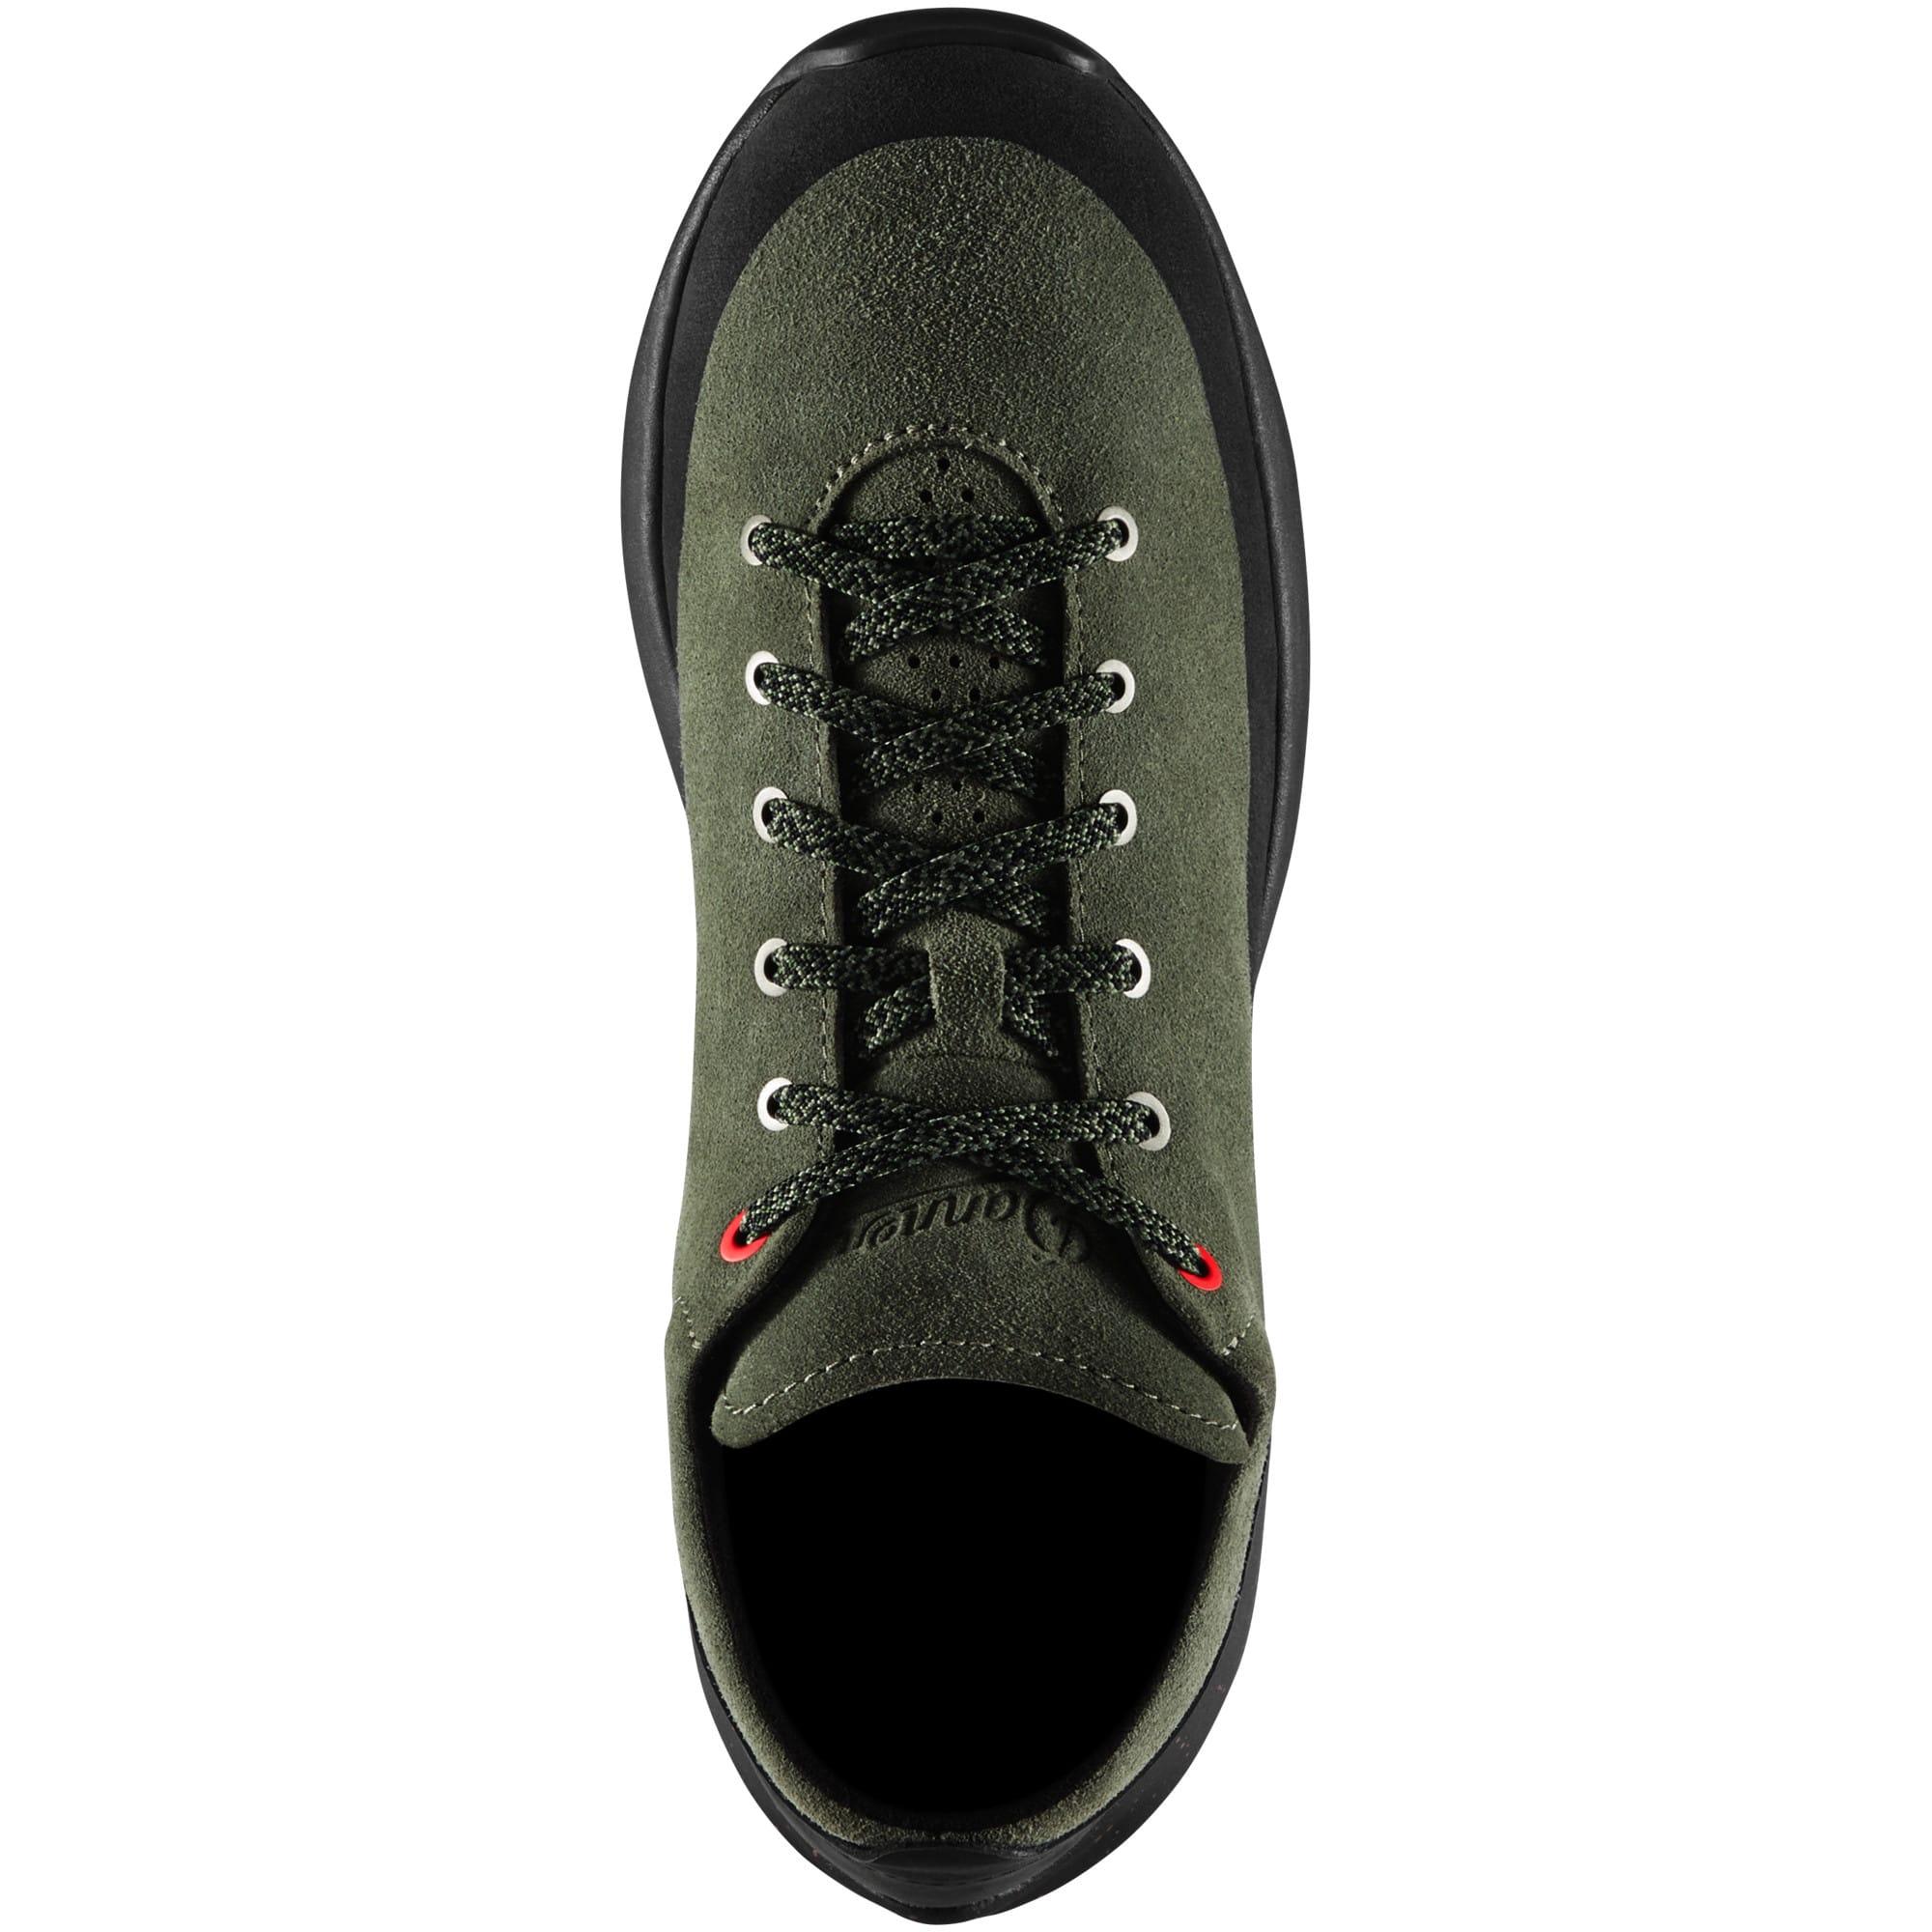 Danner Caprine Boots View Top